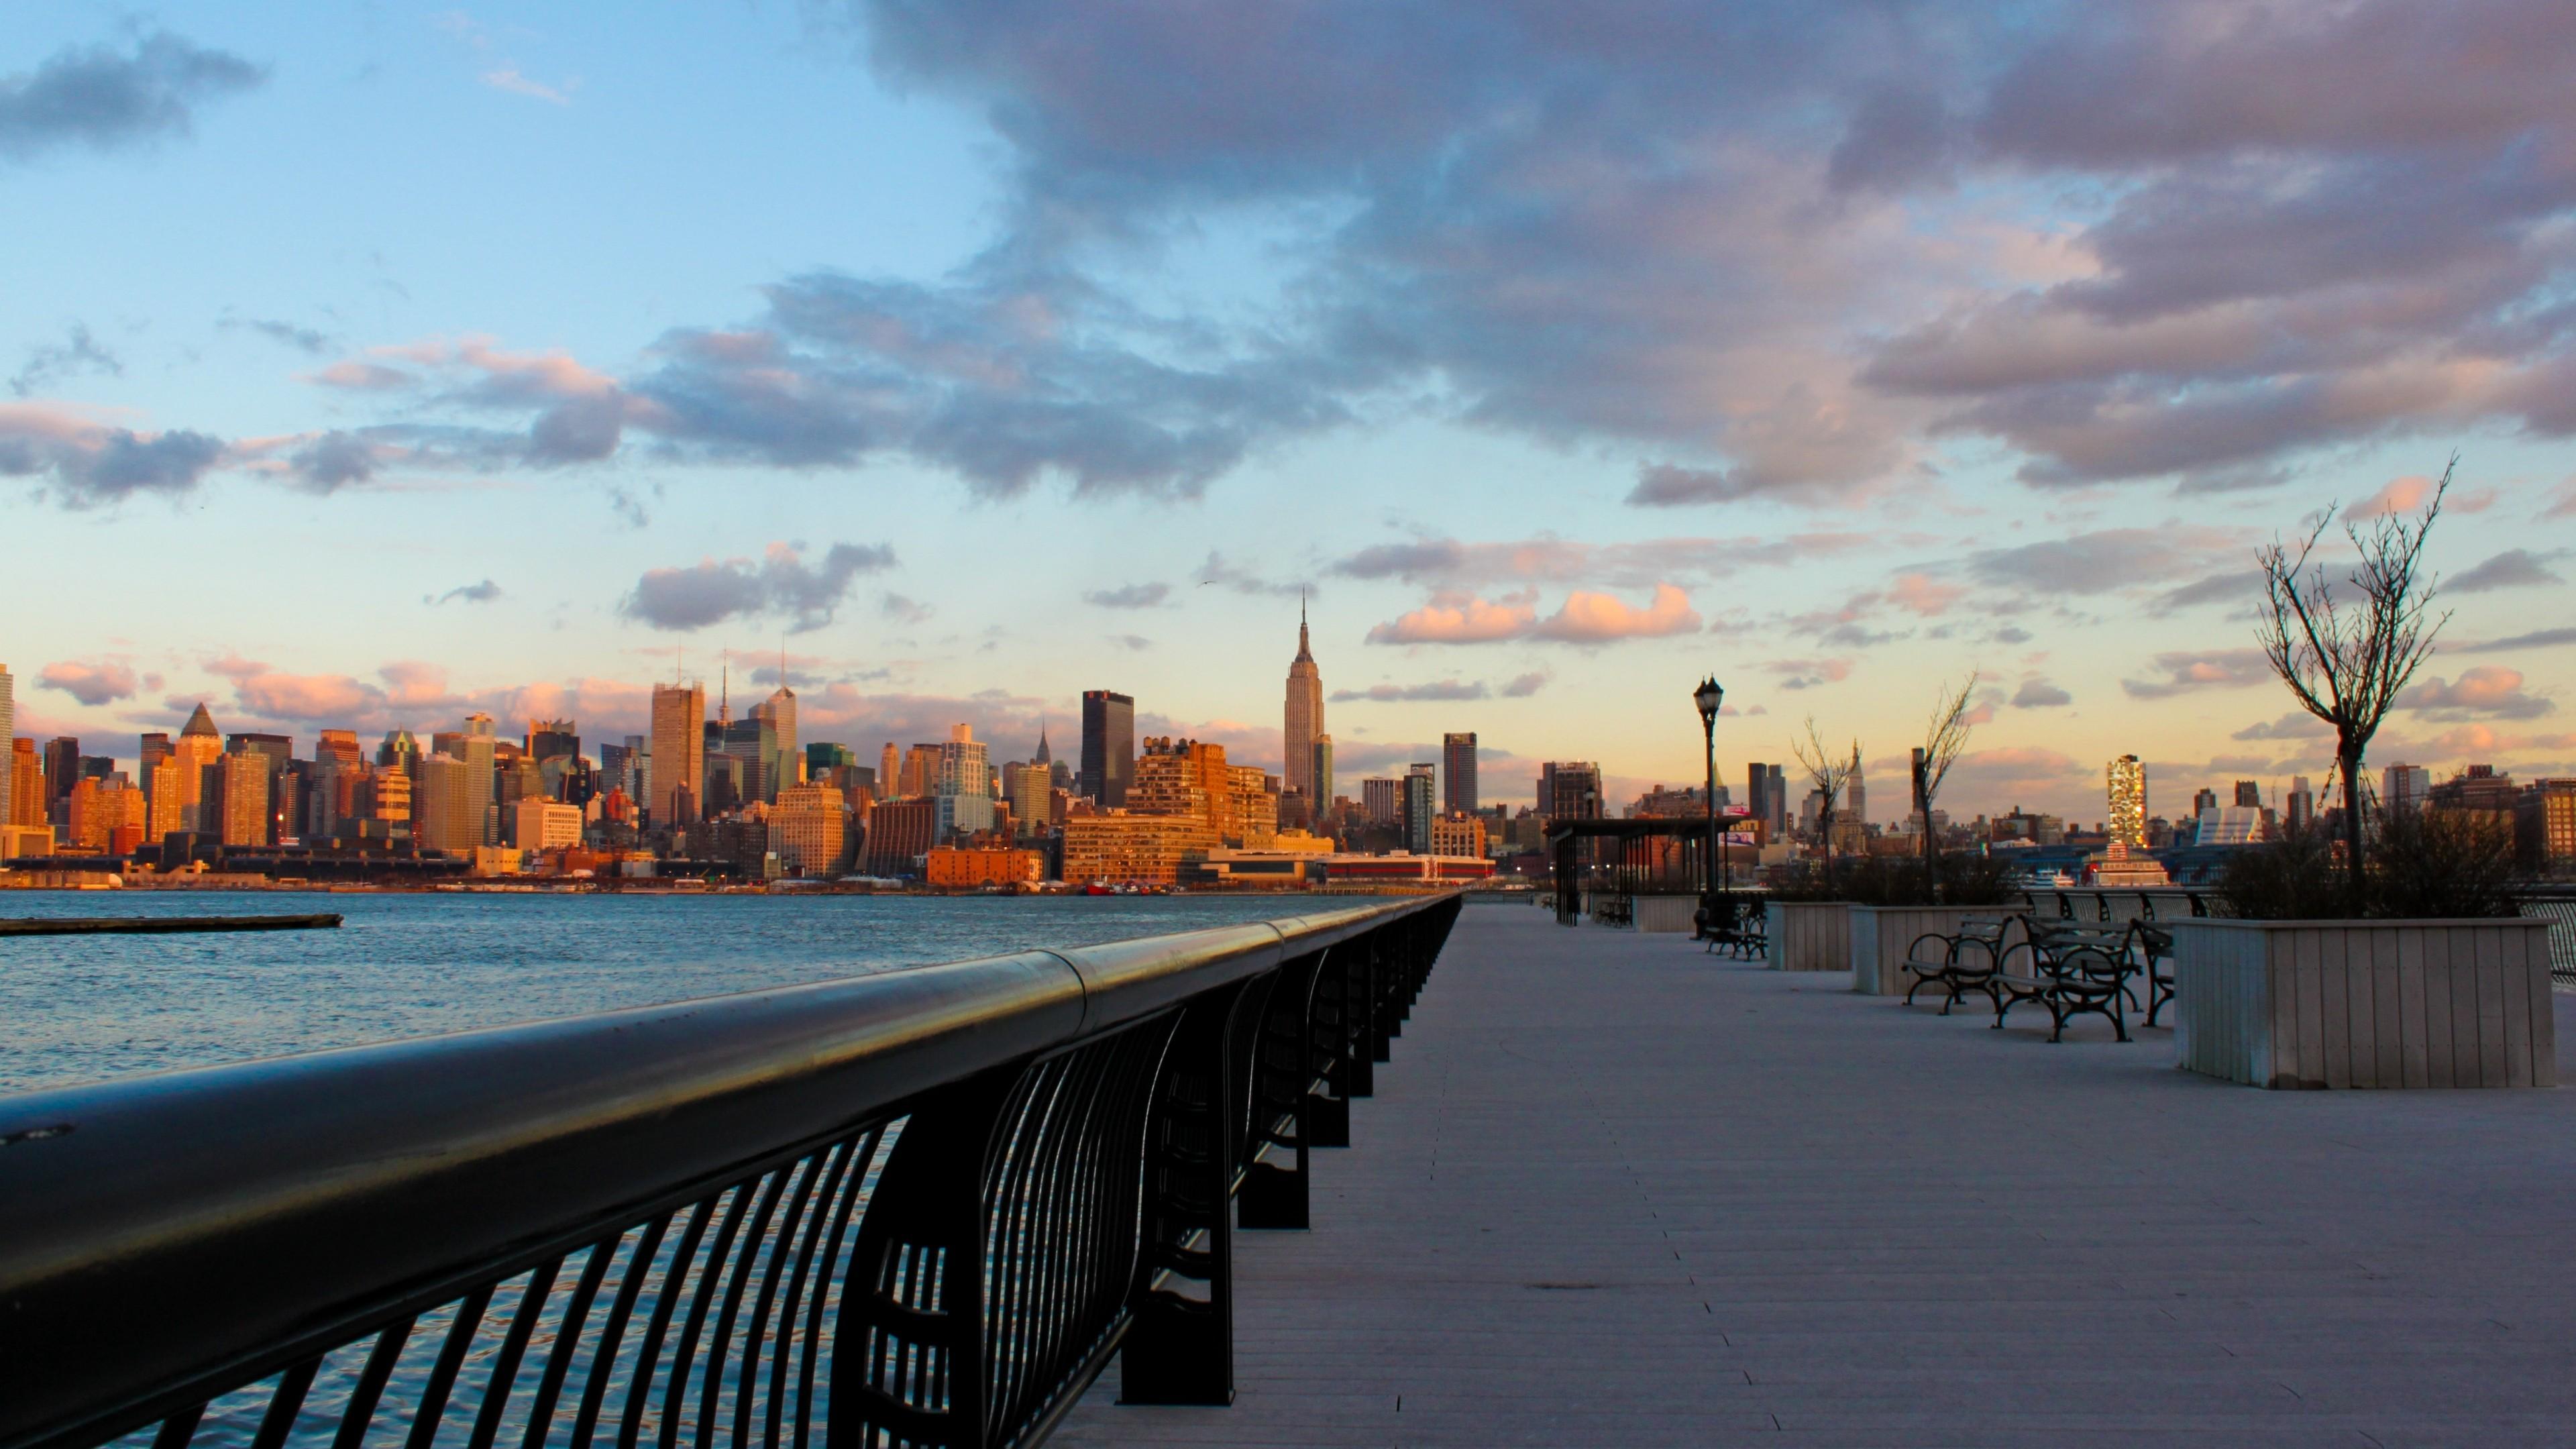 Wallpaper new york, city, night, water, sunset, skyscrapers,  embankment